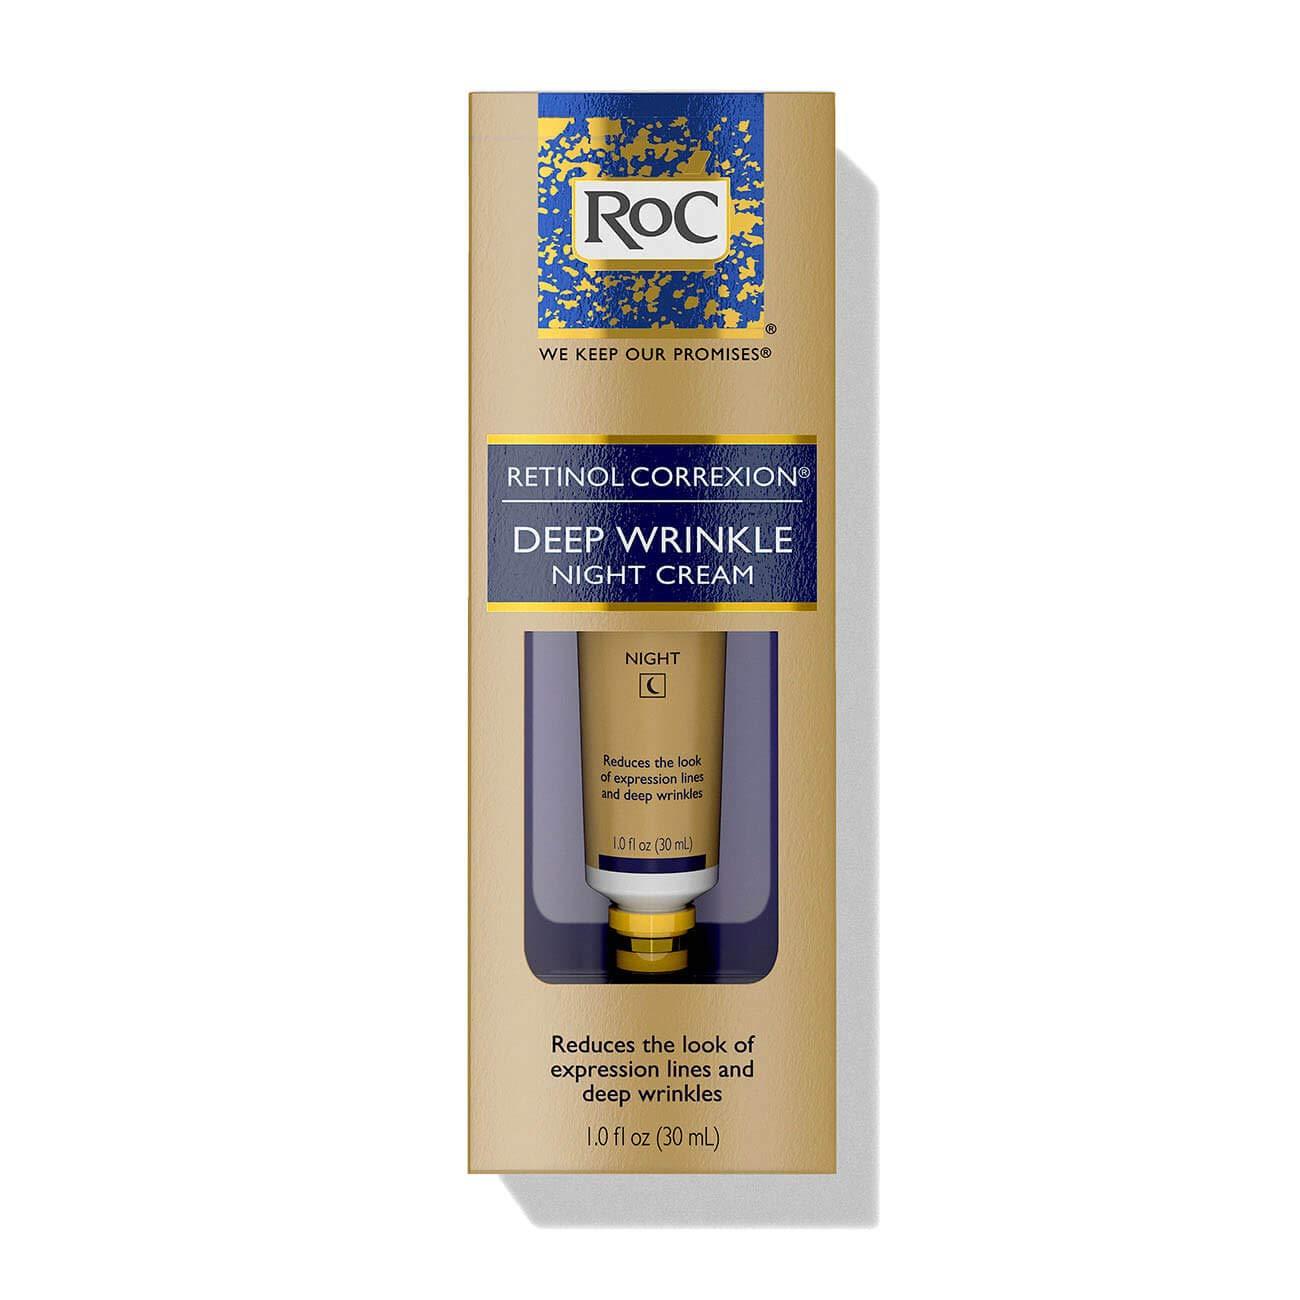 RoC Retinol Correxion Deep Wrinkle Night Cream 1.0 fl oz (30 ml)